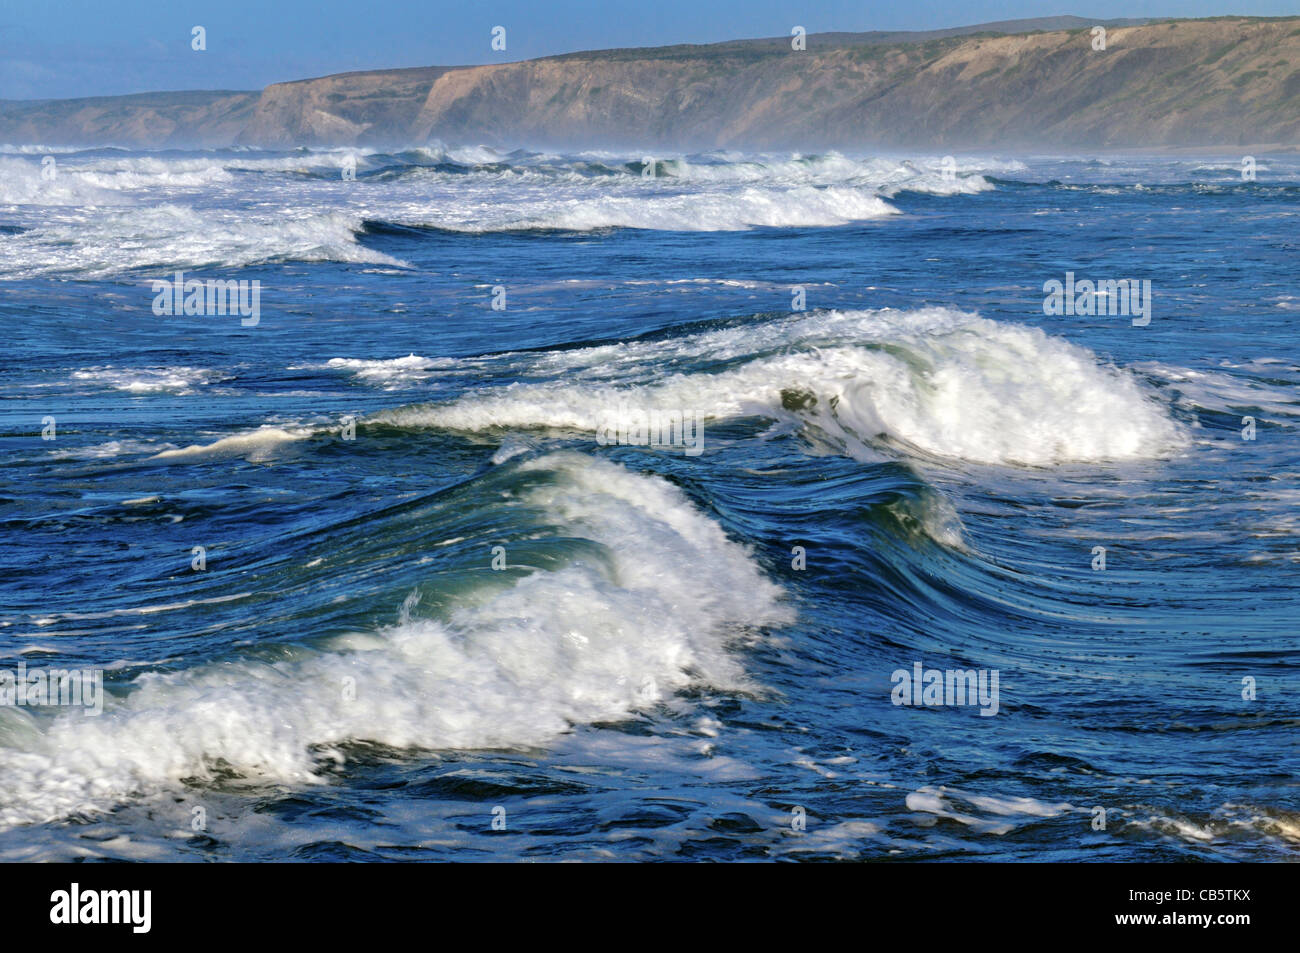 Portugal, Algarve: Waves at beach Praia da Bordeira - Stock Image